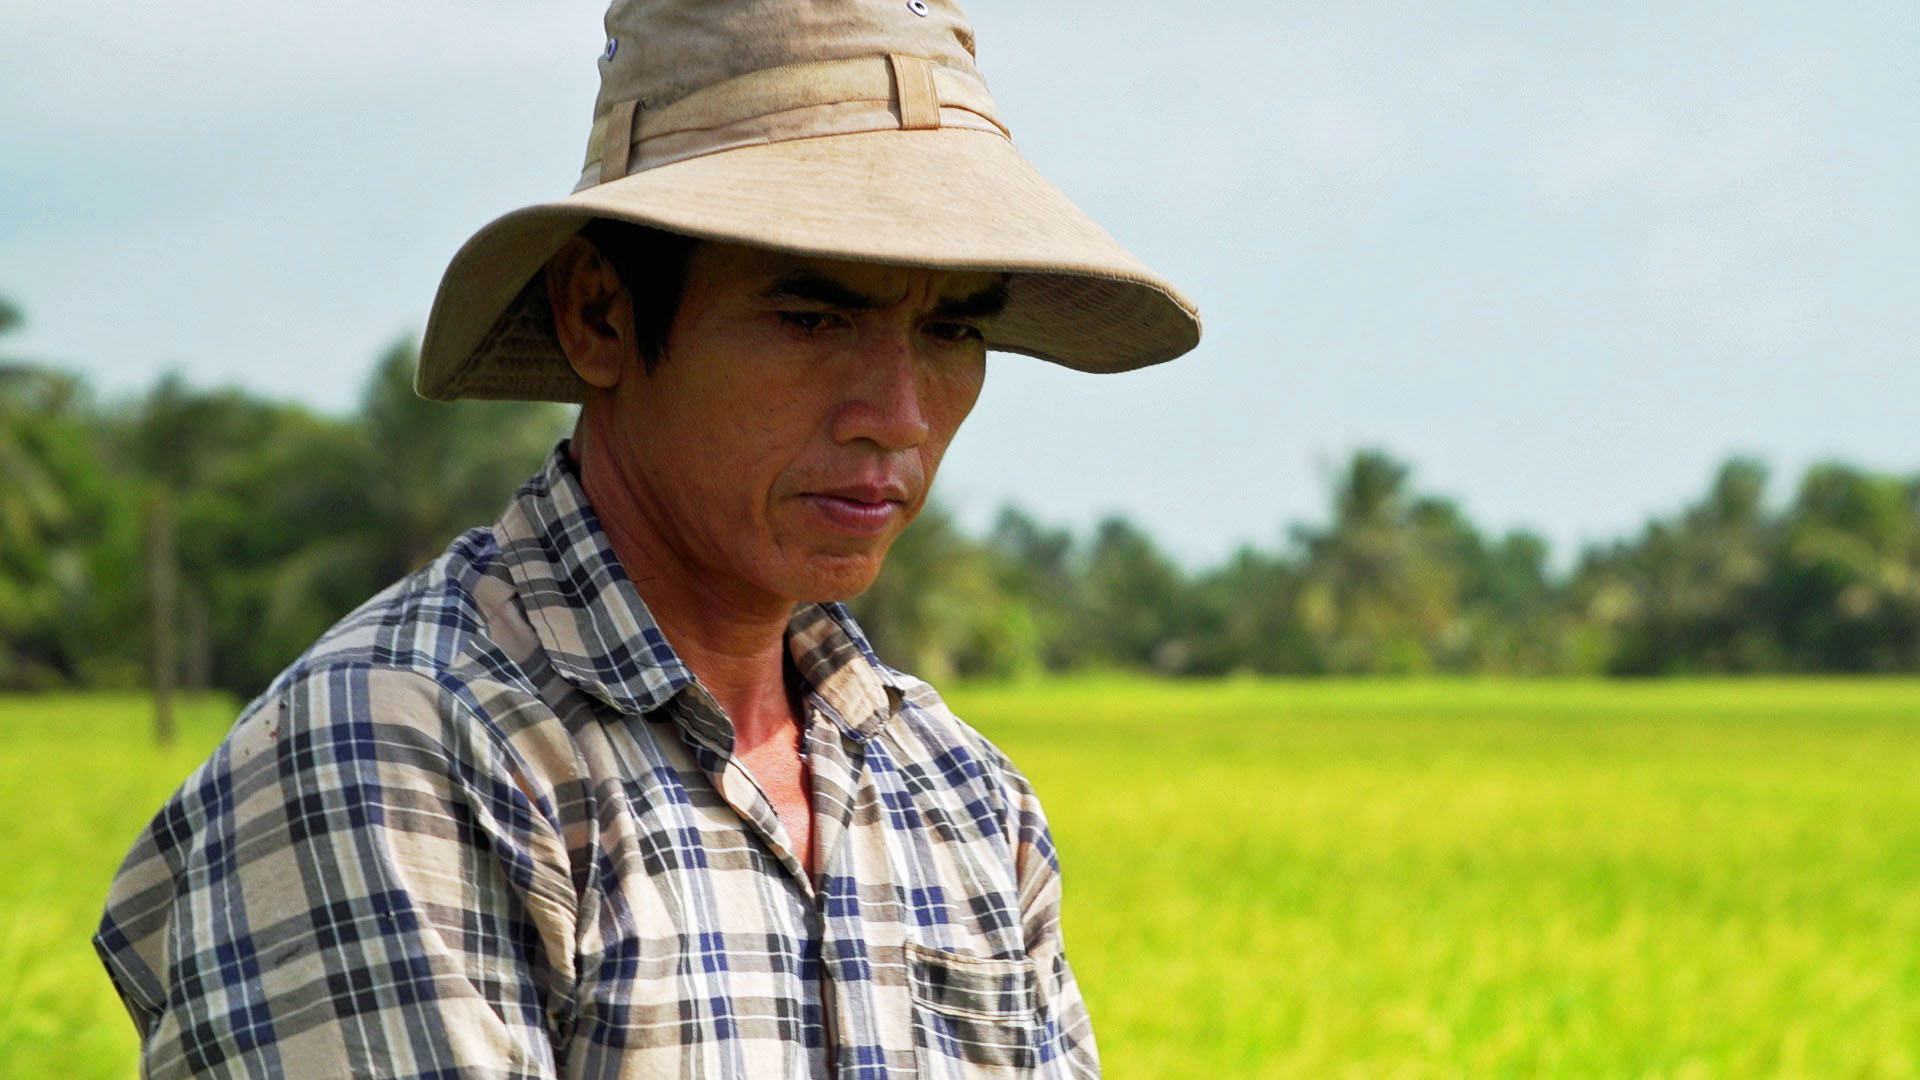 A portrait of Phan Thi Hang